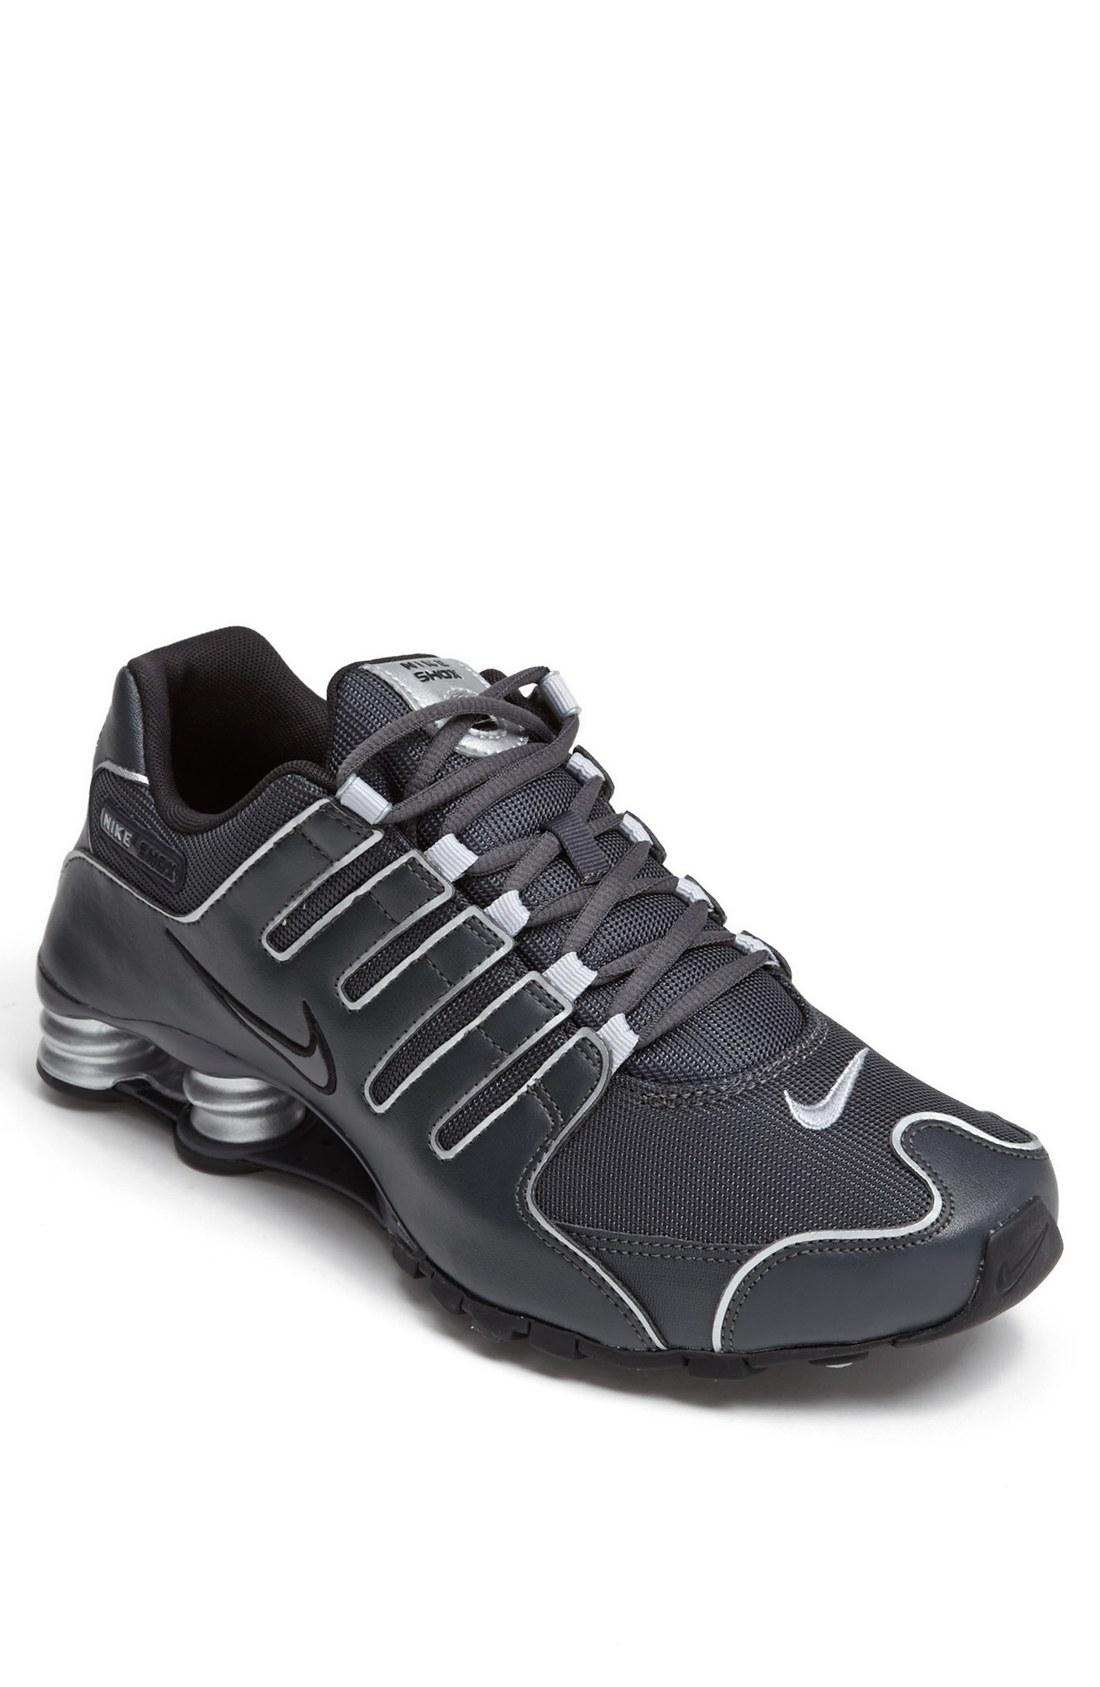 Nike Shox Black And Silver